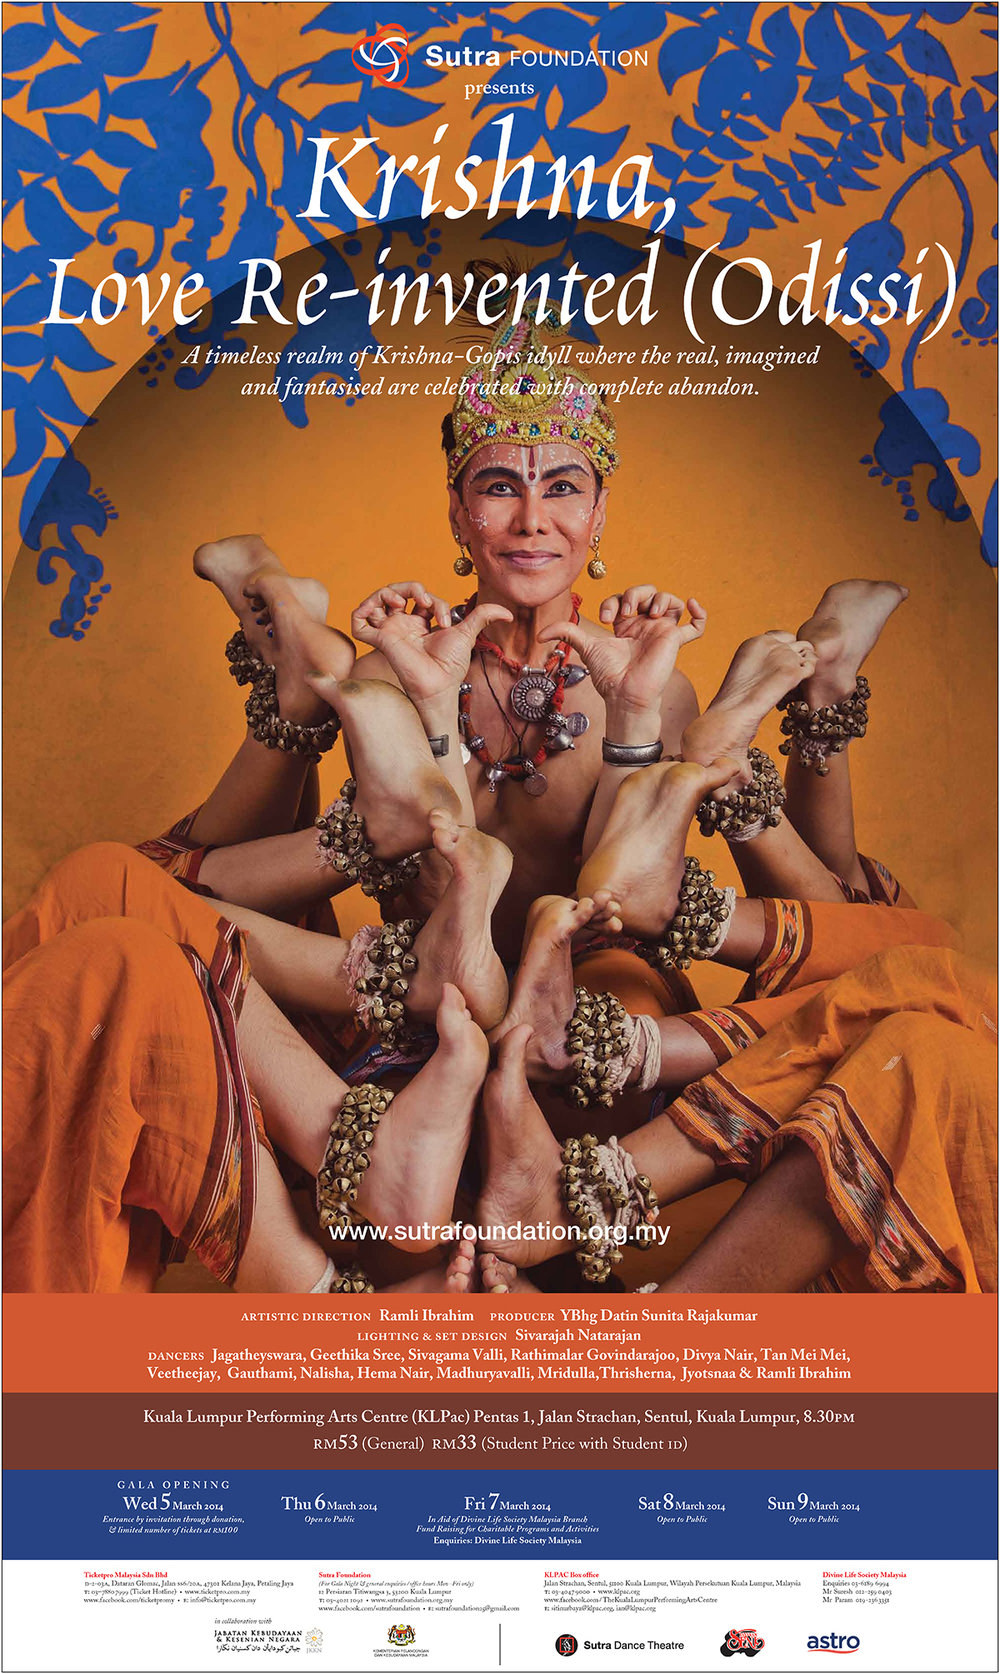 whwWeb_Sutra_Krishna_Poster.jpg